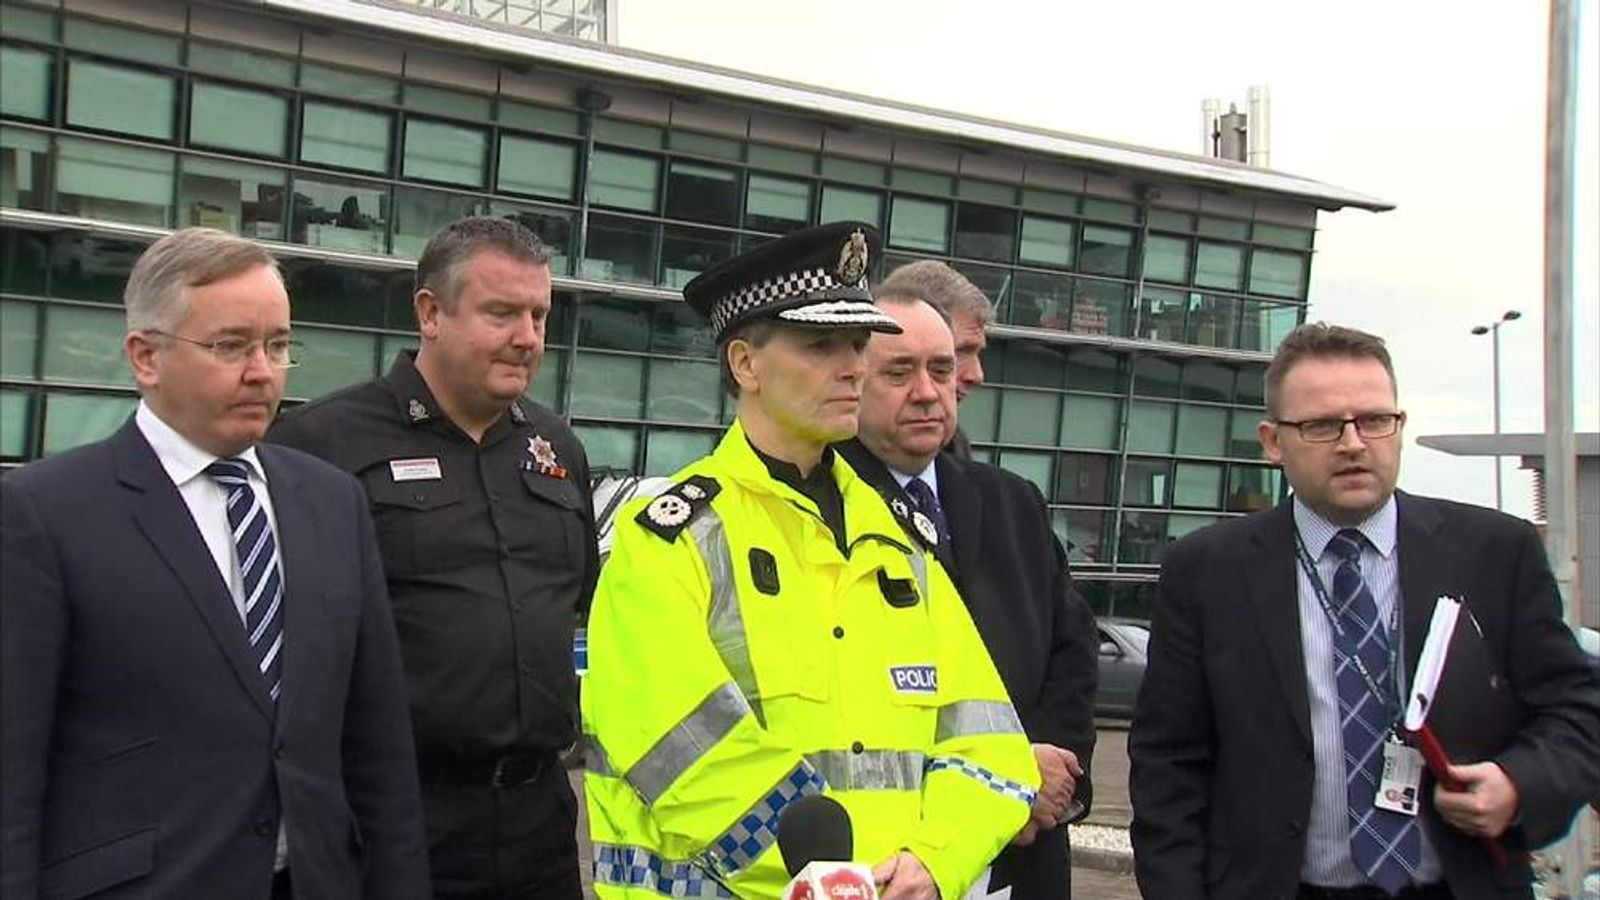 Sir Stephen House Glasgow helicopter crash